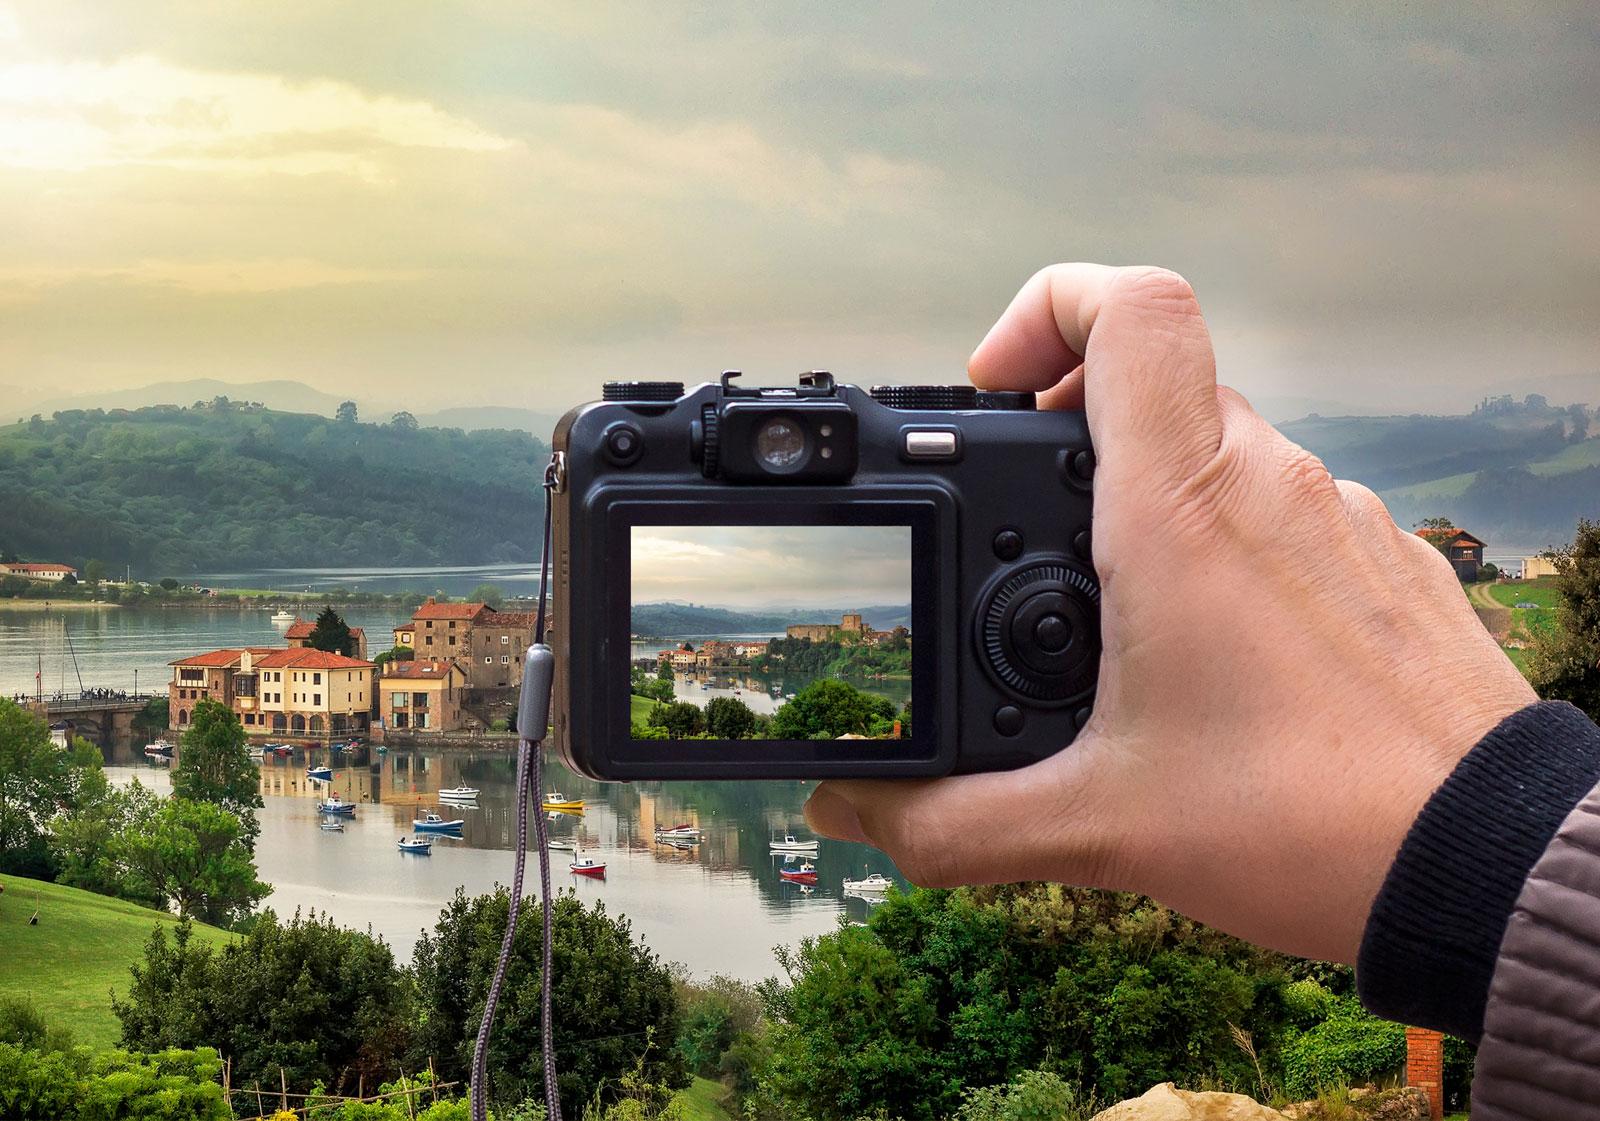 CameraPro digital cameras